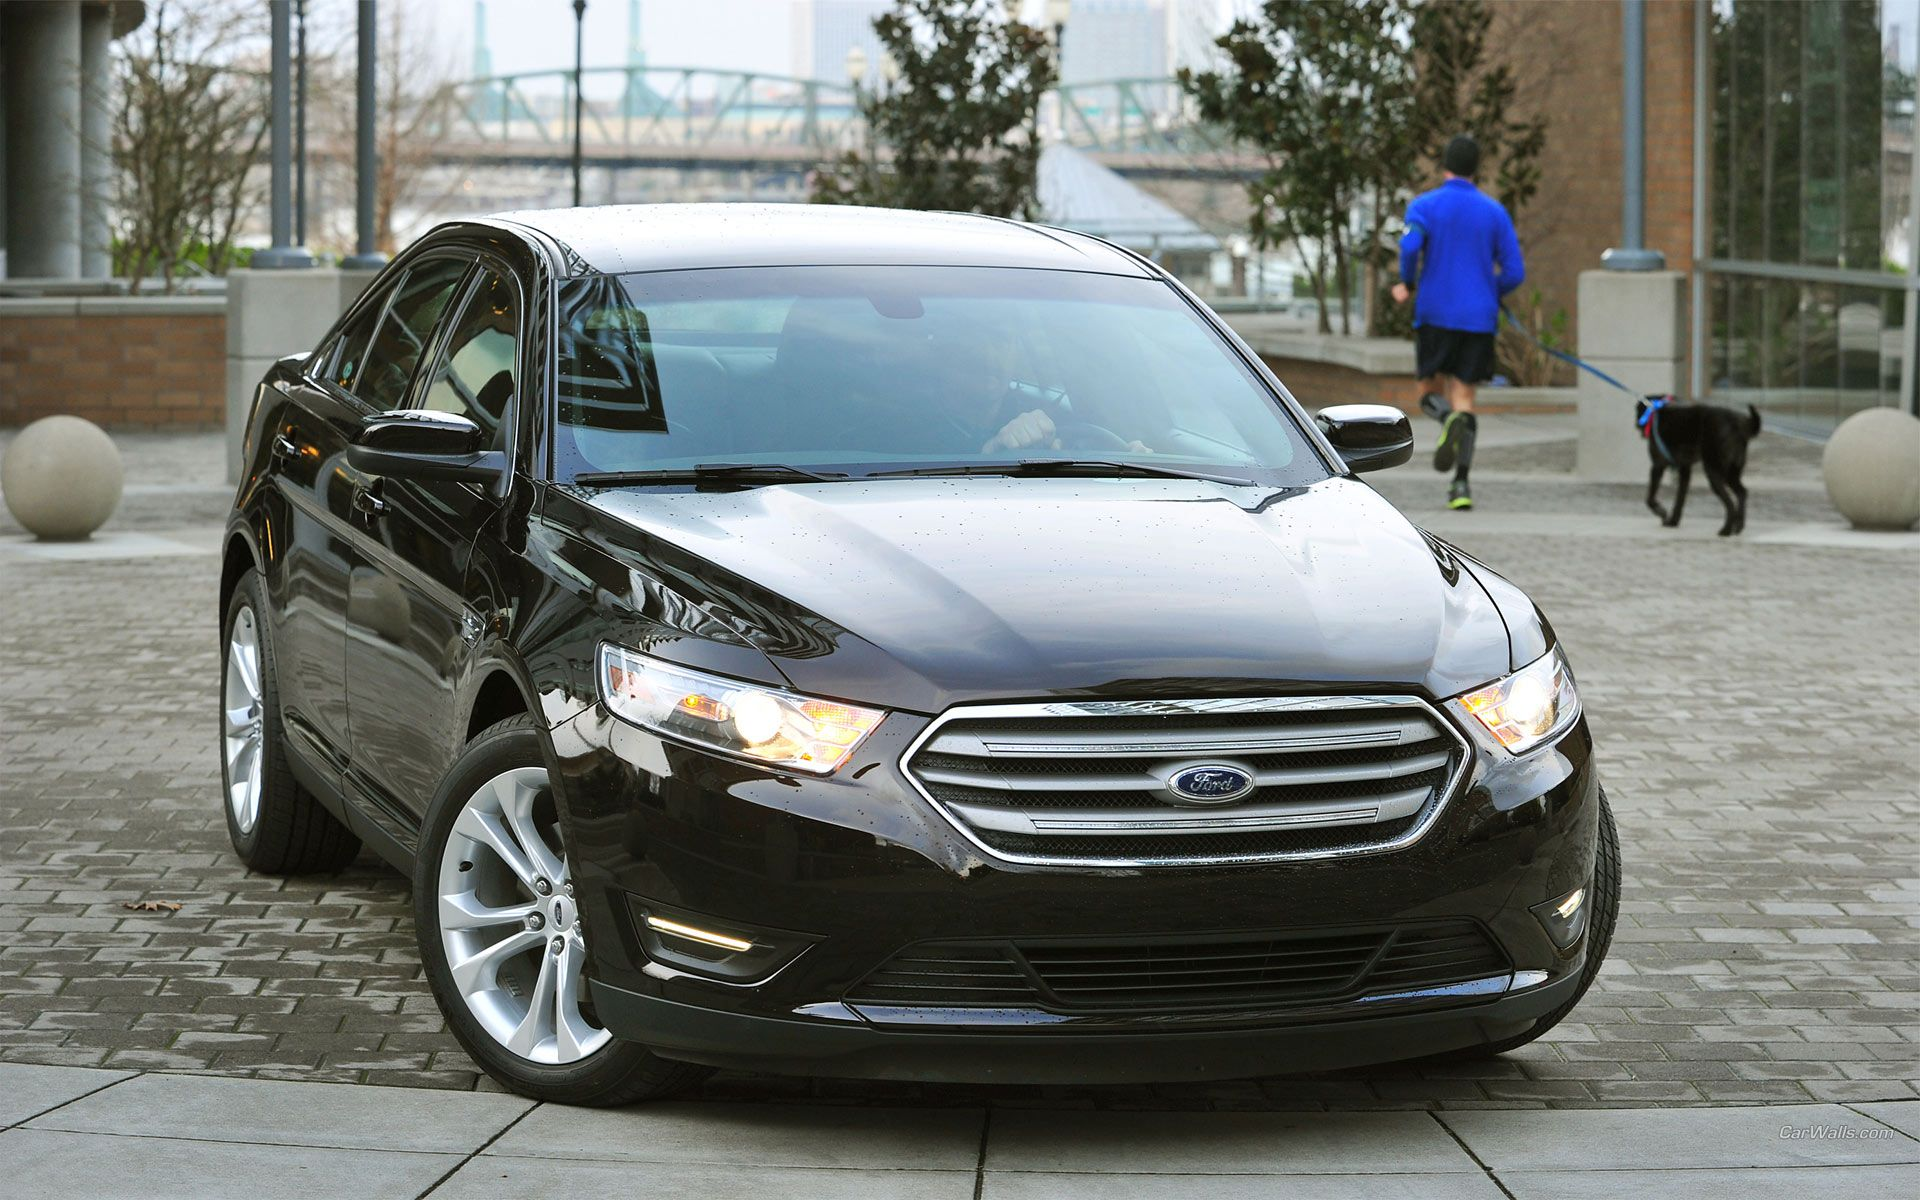 Ultra Hd Ford Taurus 2013 01 1920 1200 In 2020 Ford Motor